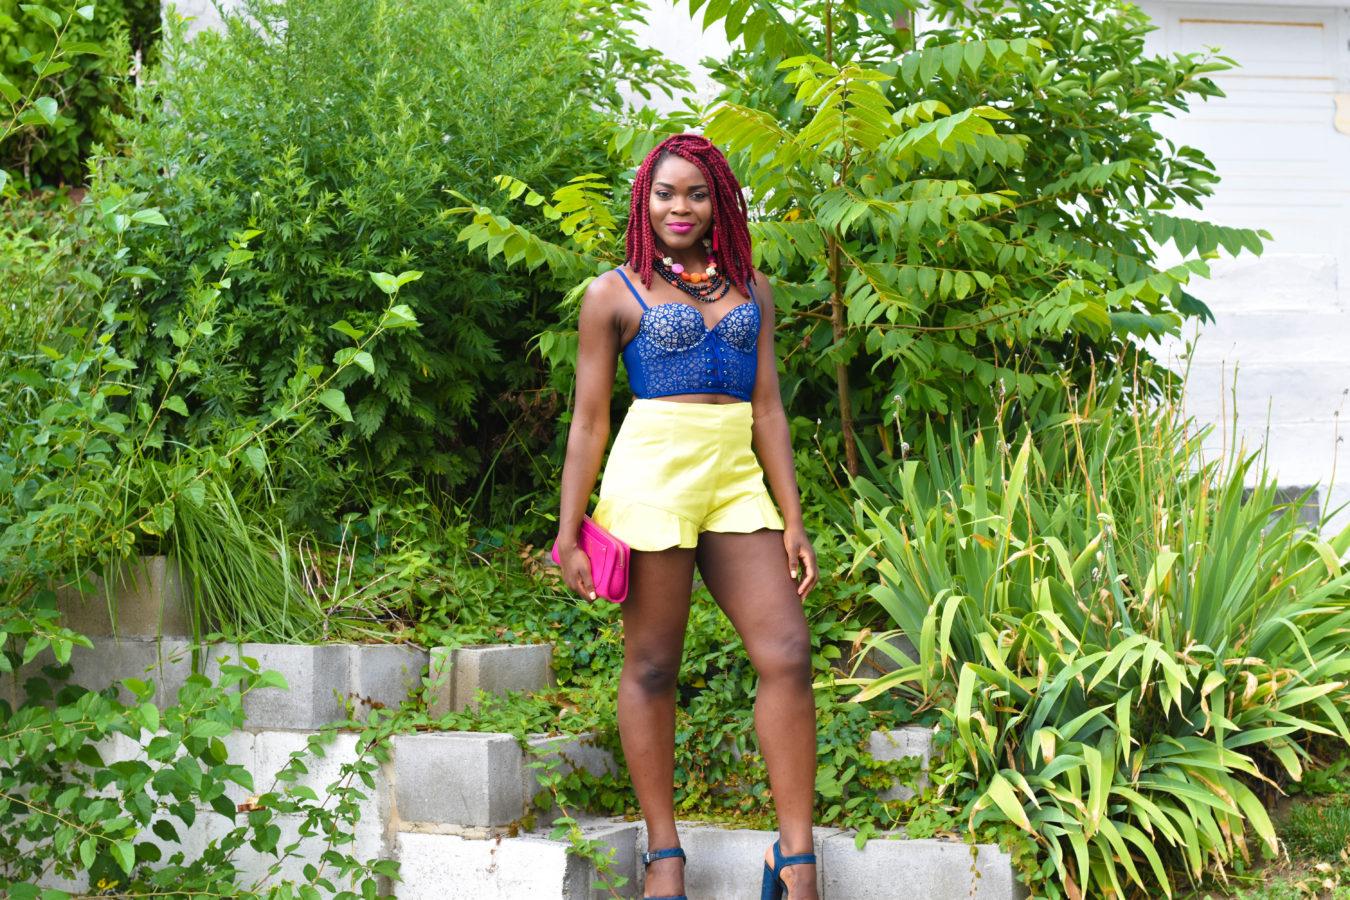 Navy Bustier + Yellow Ruffle Shorts | Miami Swim Week 2017 - Befitting Style